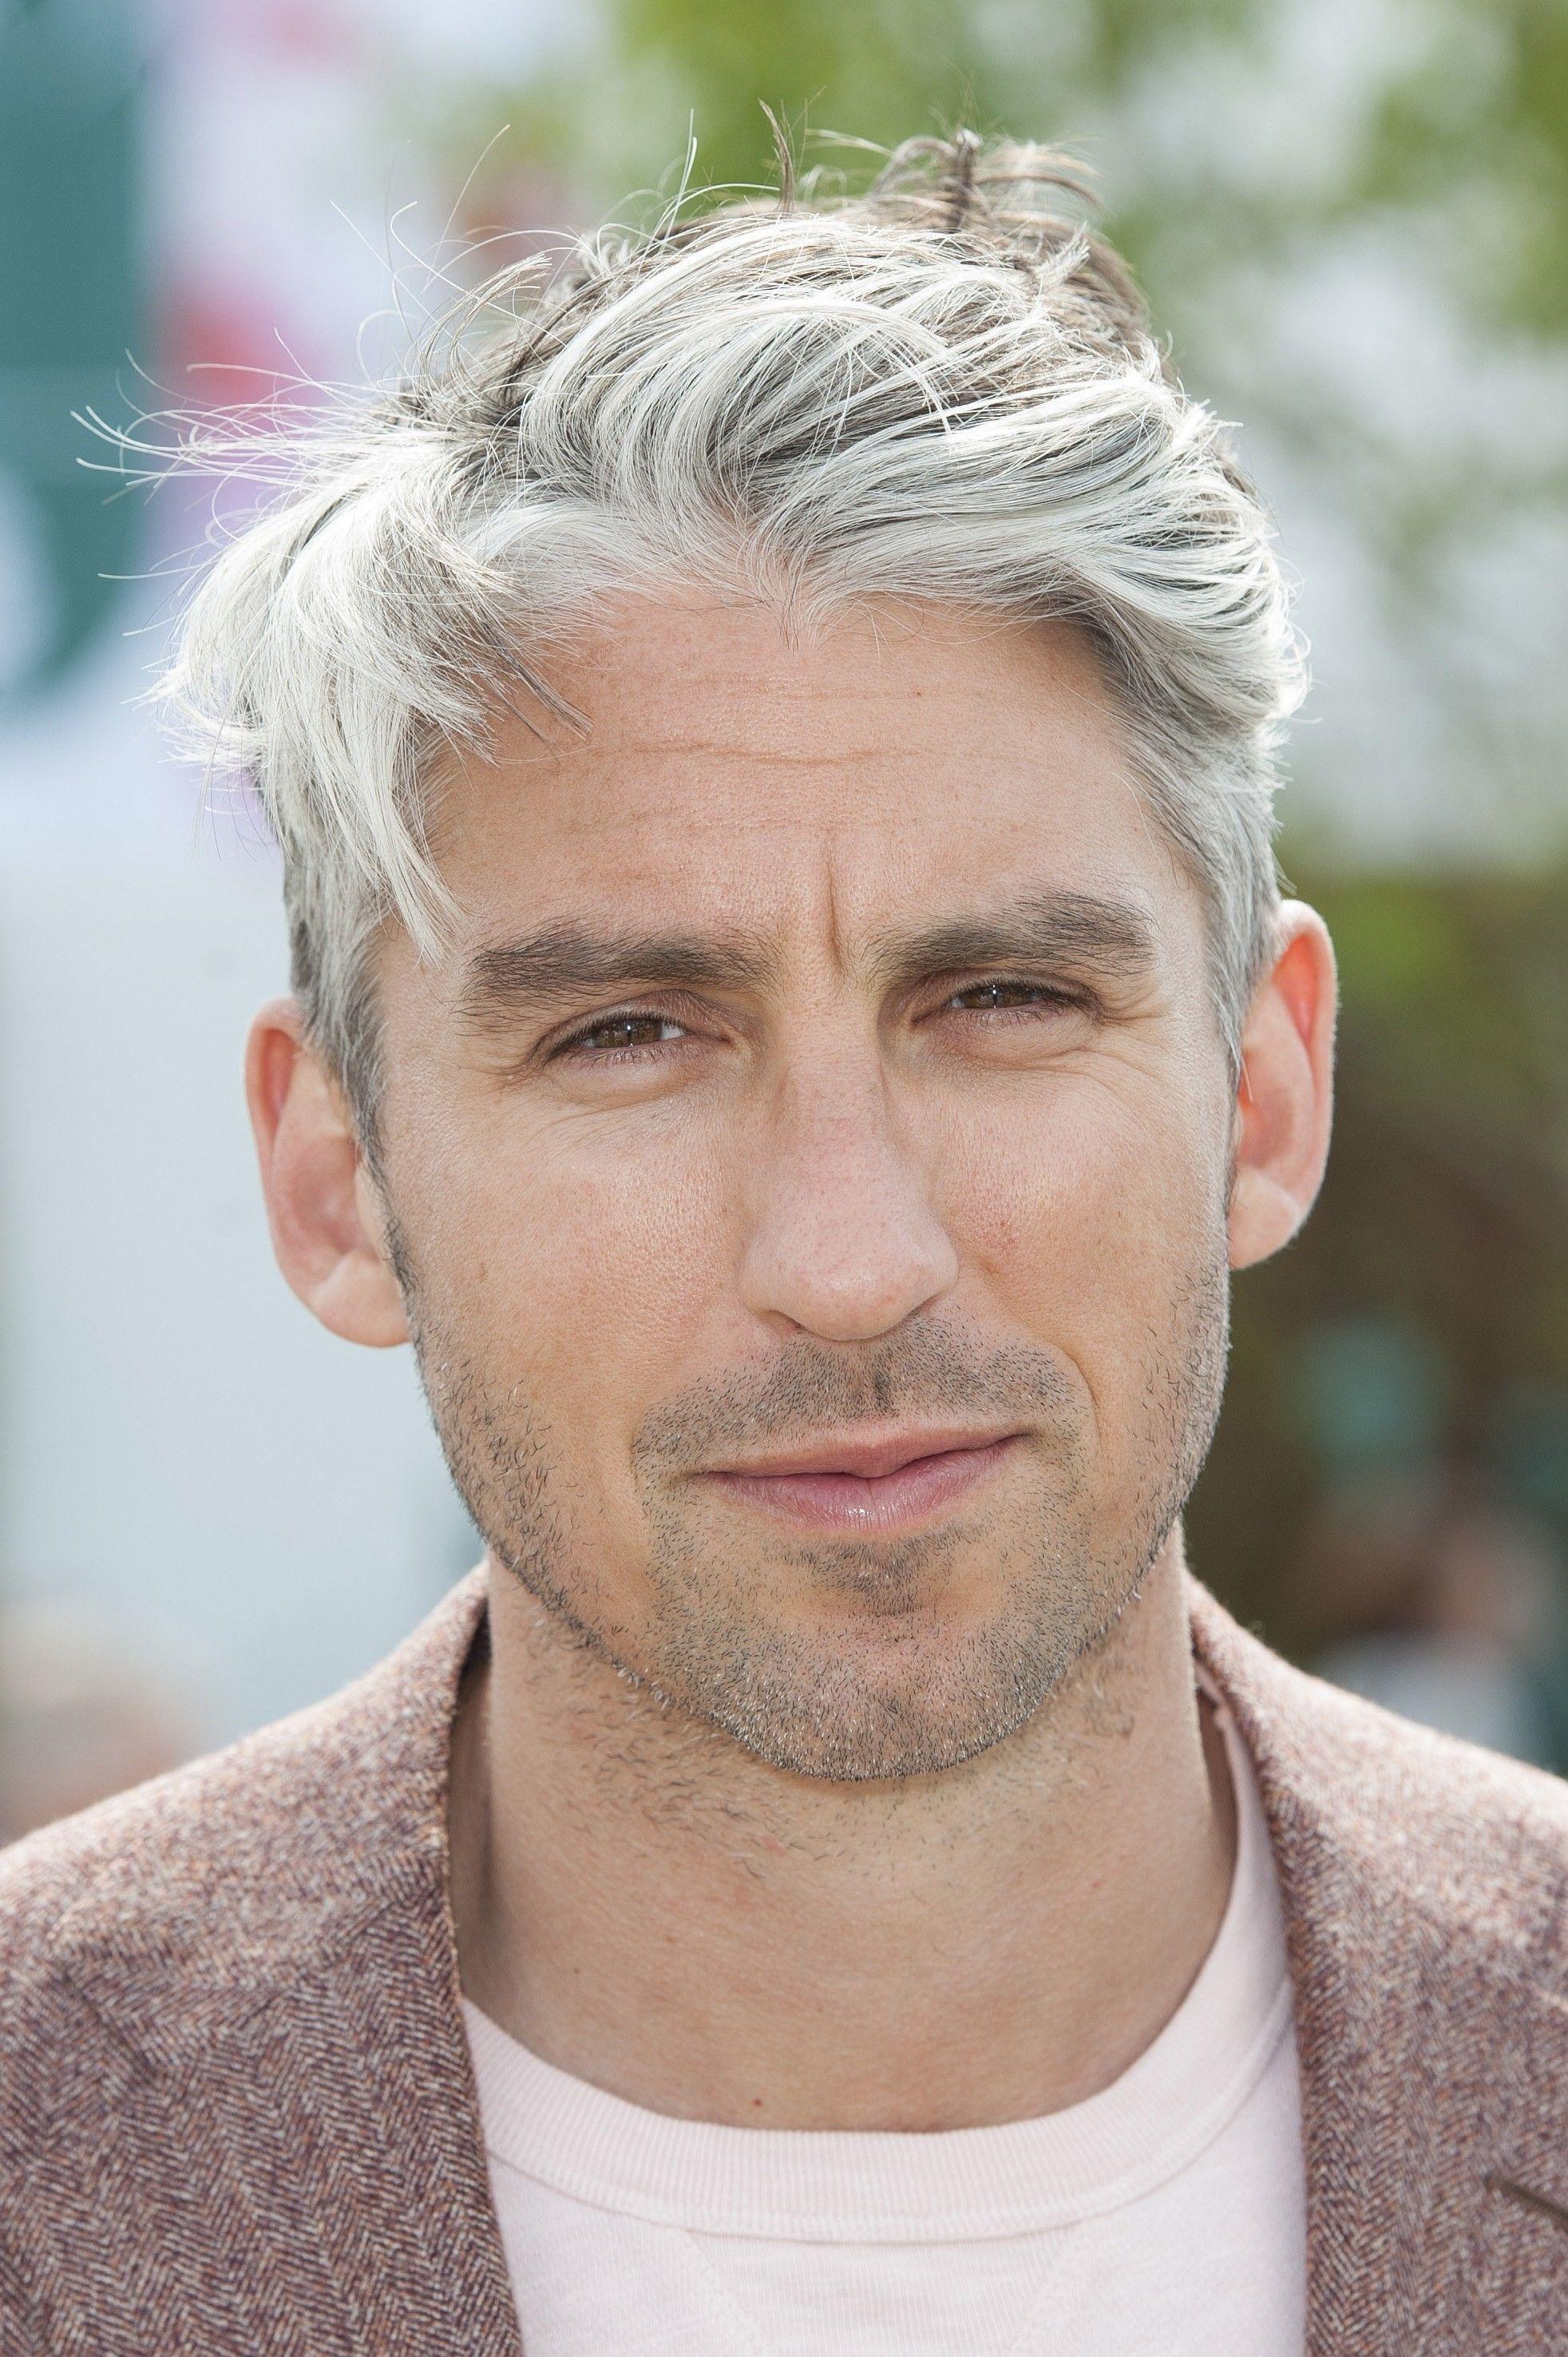 New Good Men Short Cut Hairstyle Gray Hair Https://besthairstylemen.com/